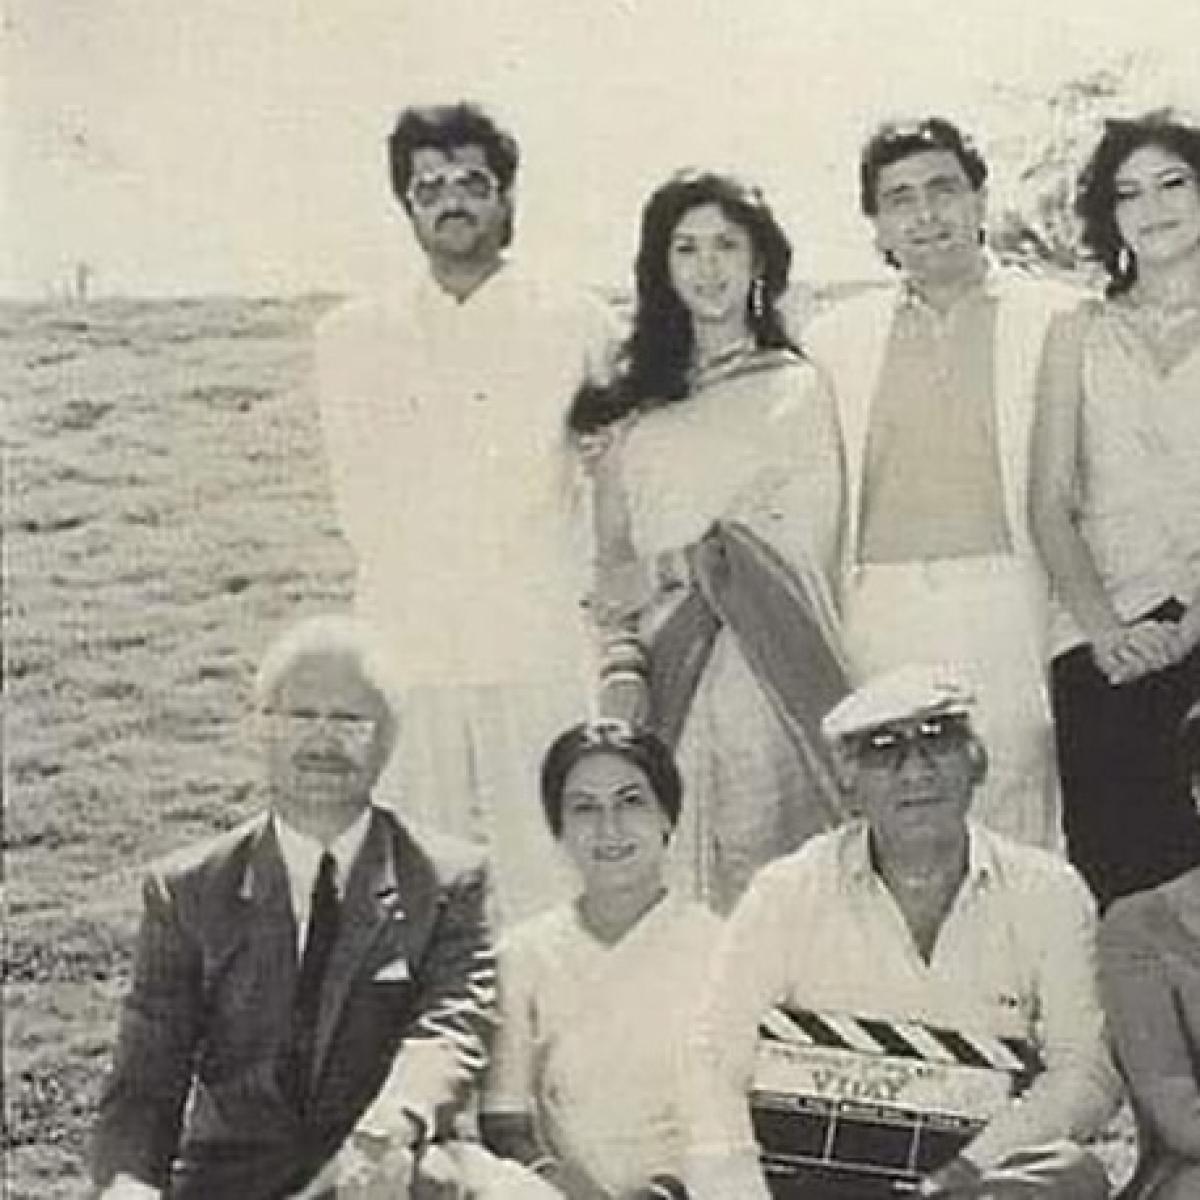 Legends in a frame: Rajesh Khanna, Anupam Kher, Yash Chopra, Rishi & Anil Kapoor in rare throwback pic